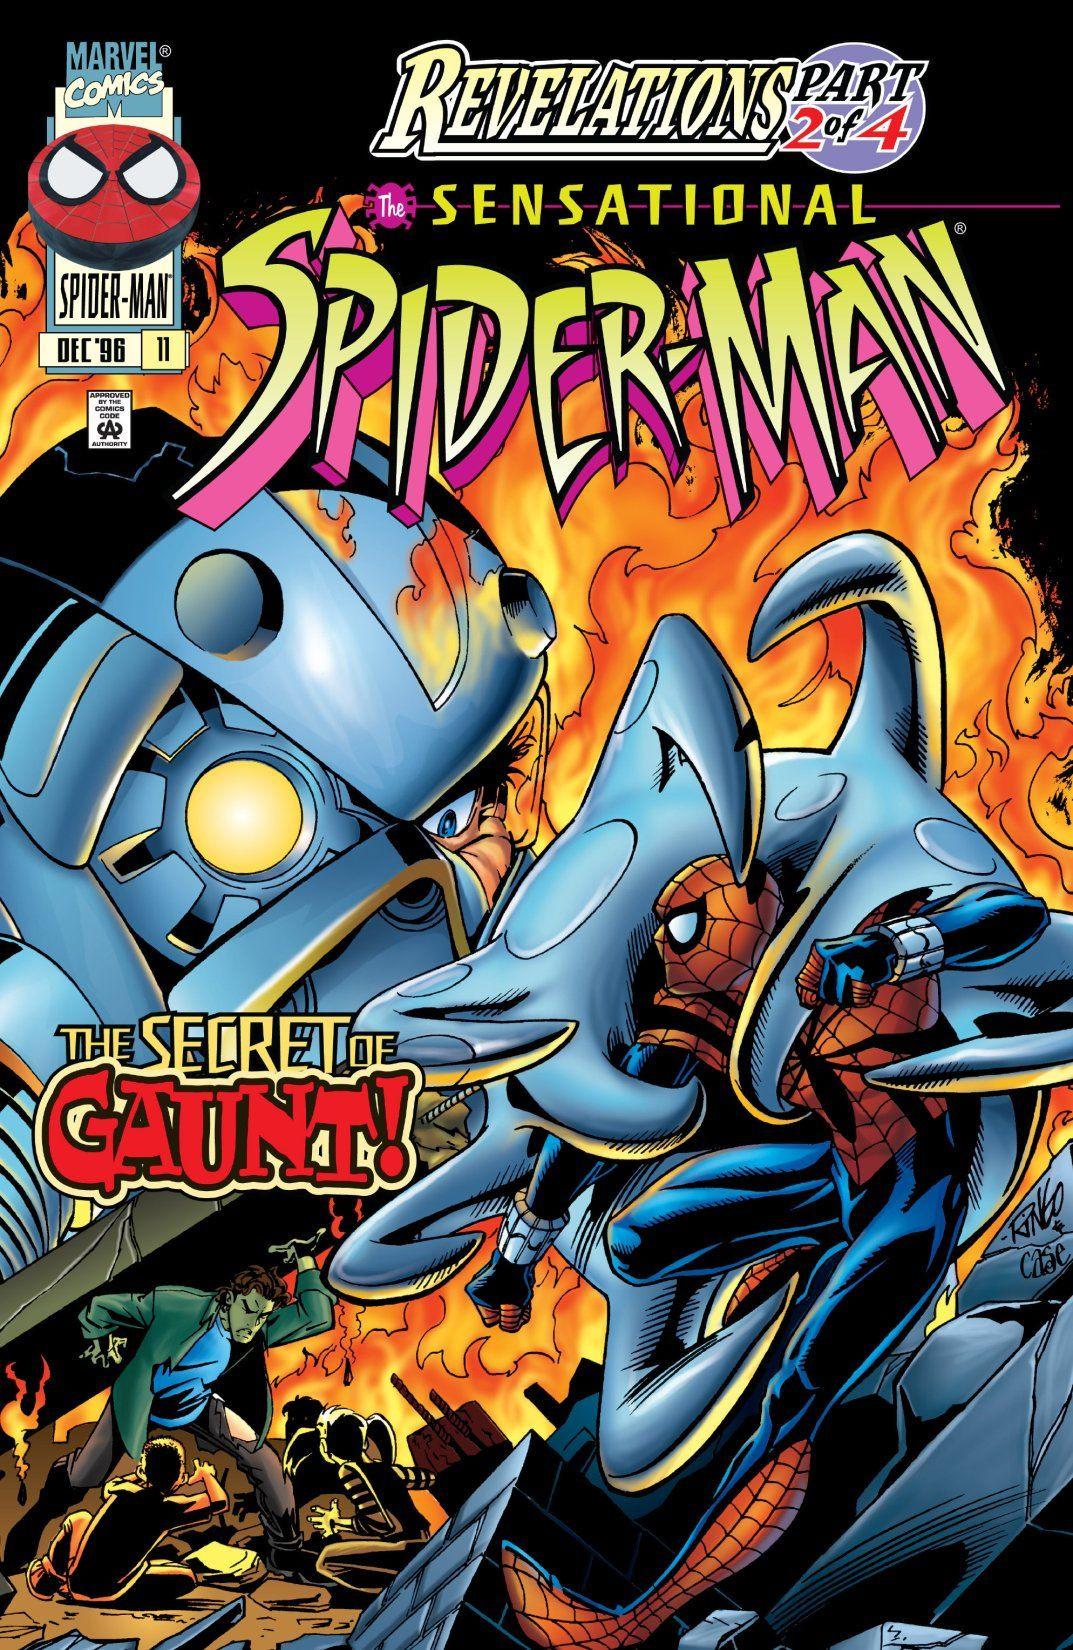 The Sensational Spider-Man #11